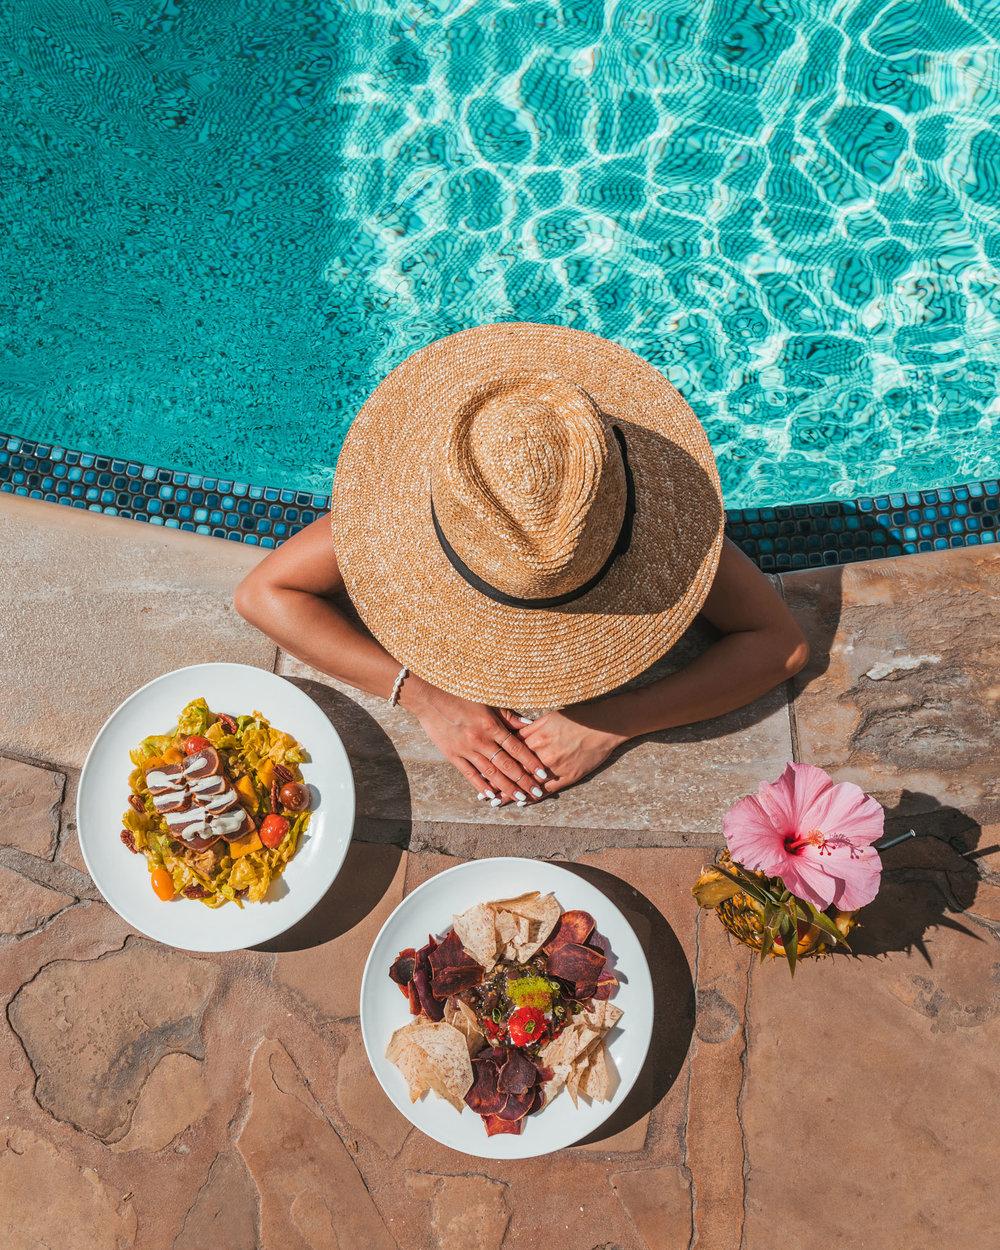 Poolside lunch at Hyatt Regency Maui  // The Quick Guide to Visiting Maui, Hawaii #readysetjetset #hawaii #maui